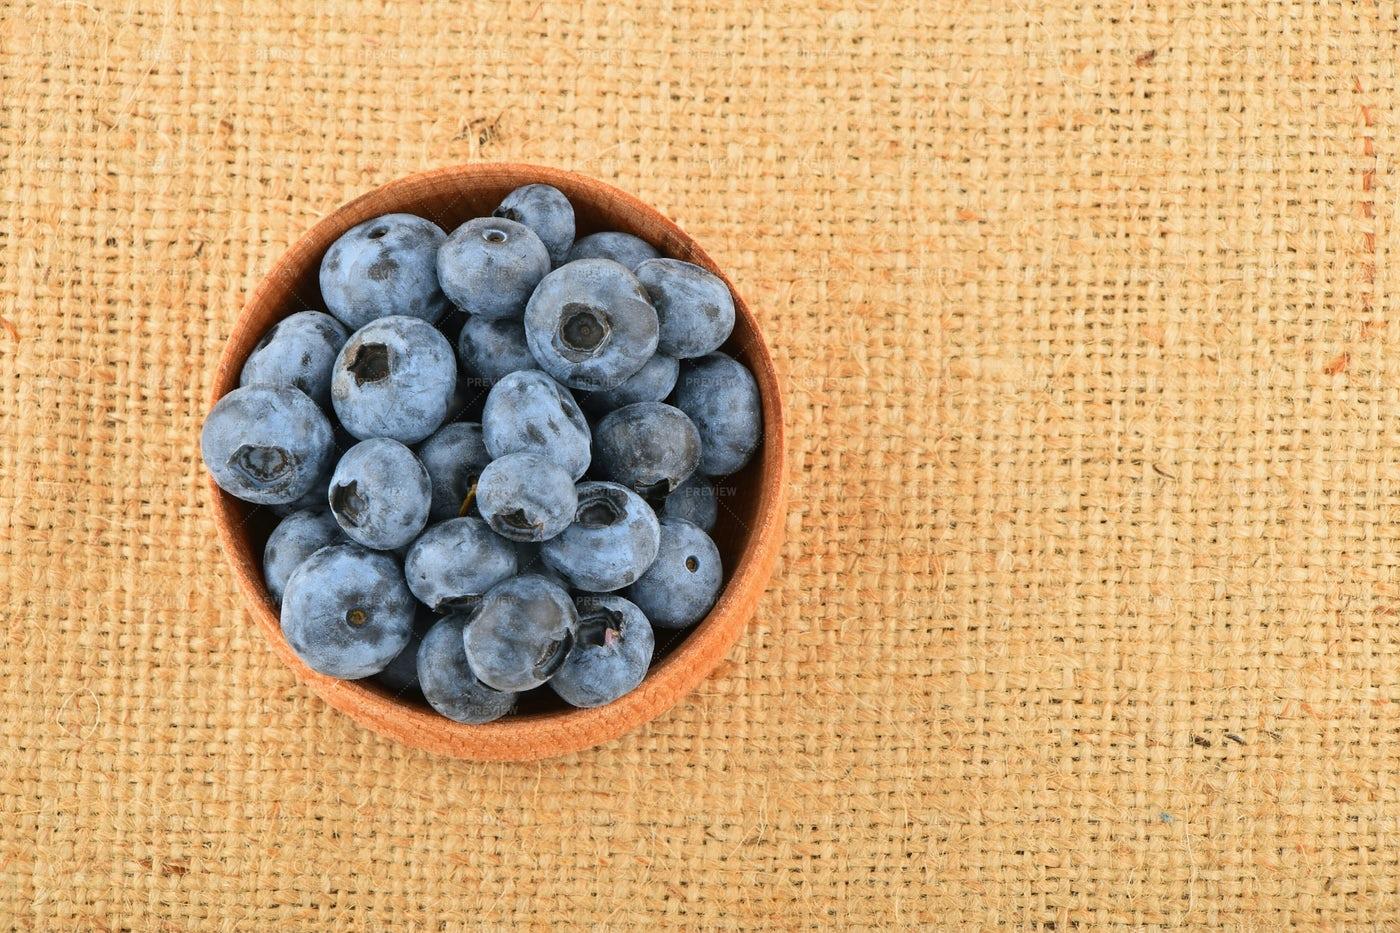 Bowl Of Blueberries: Stock Photos